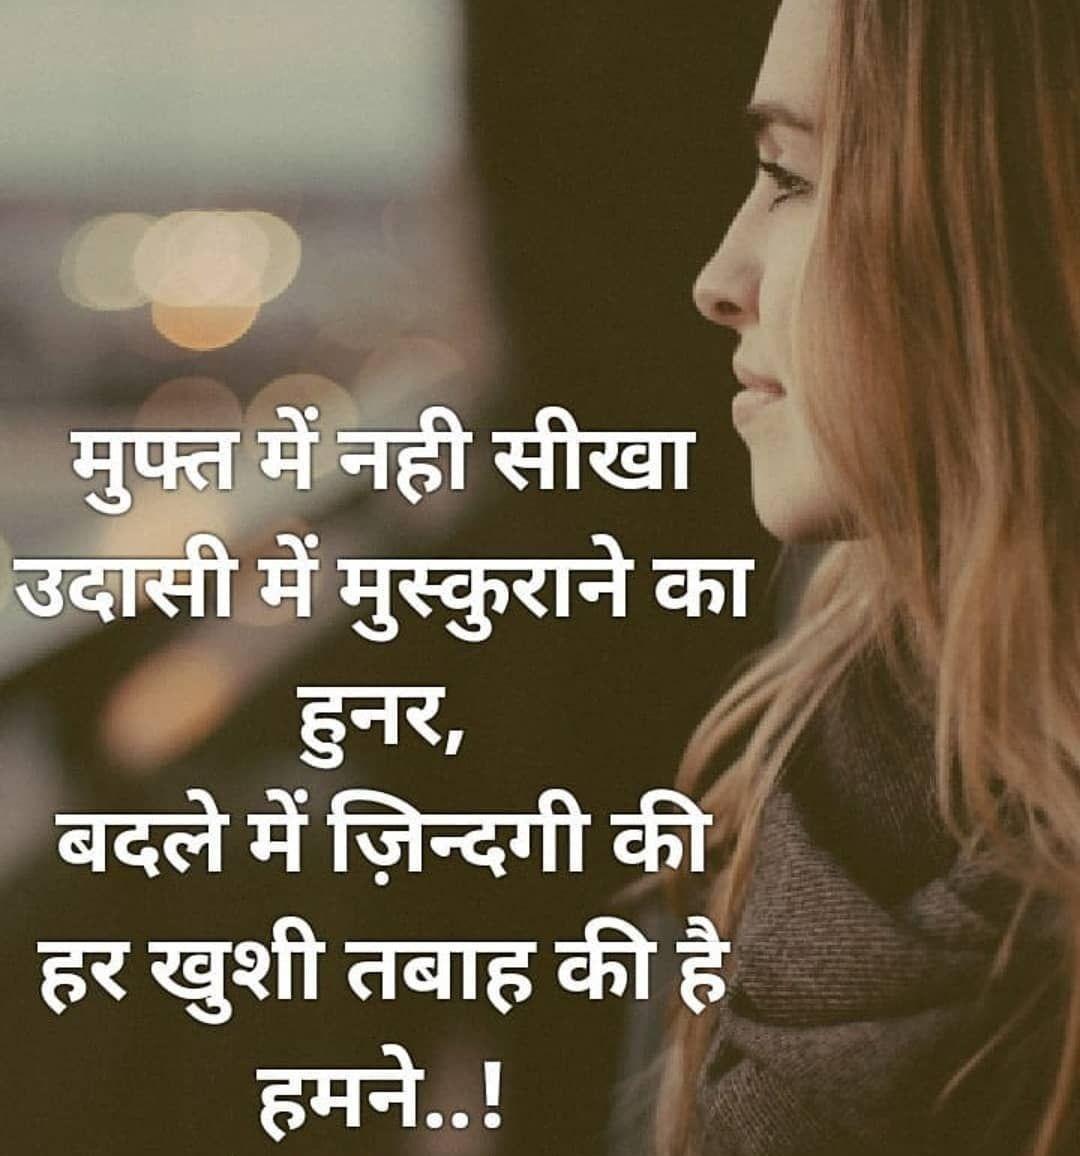 very sad WhatsApp status images download